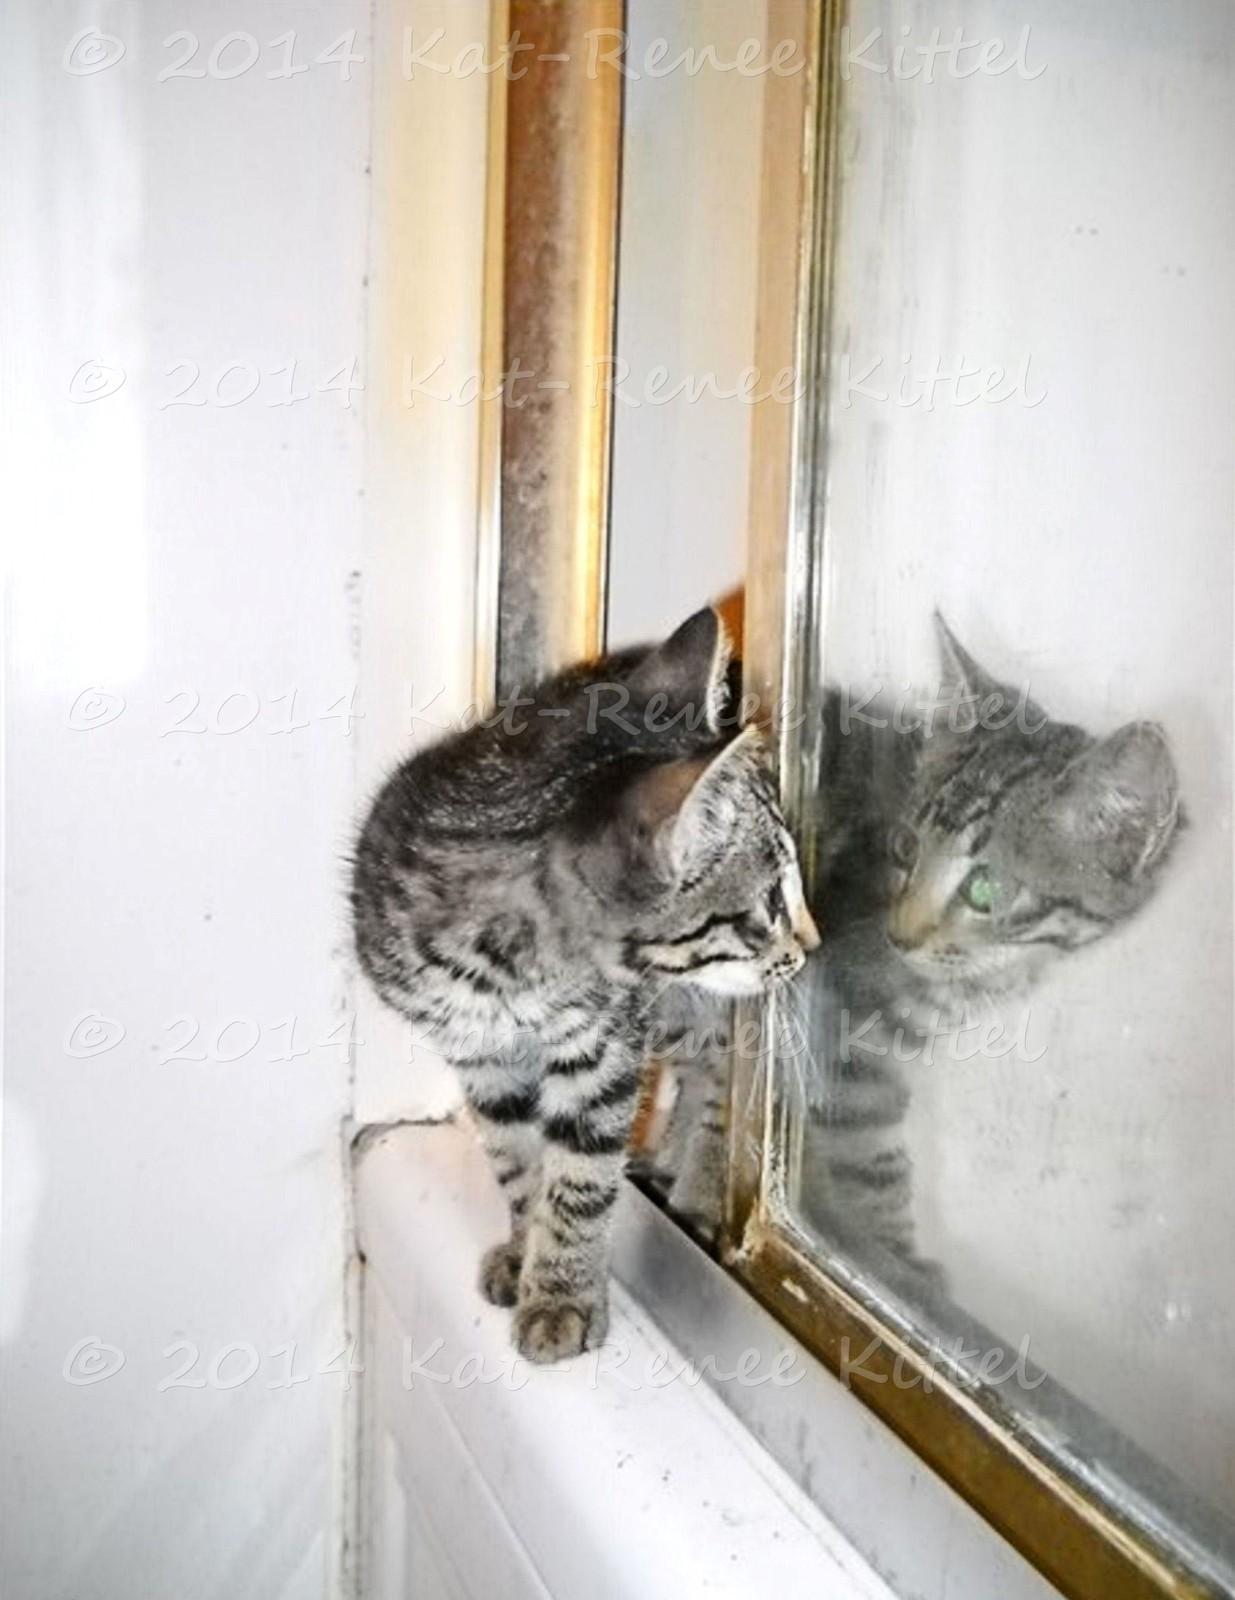 Mirror Kitten National Geographic Original Photo Cat Print Kat-Renee Kittel